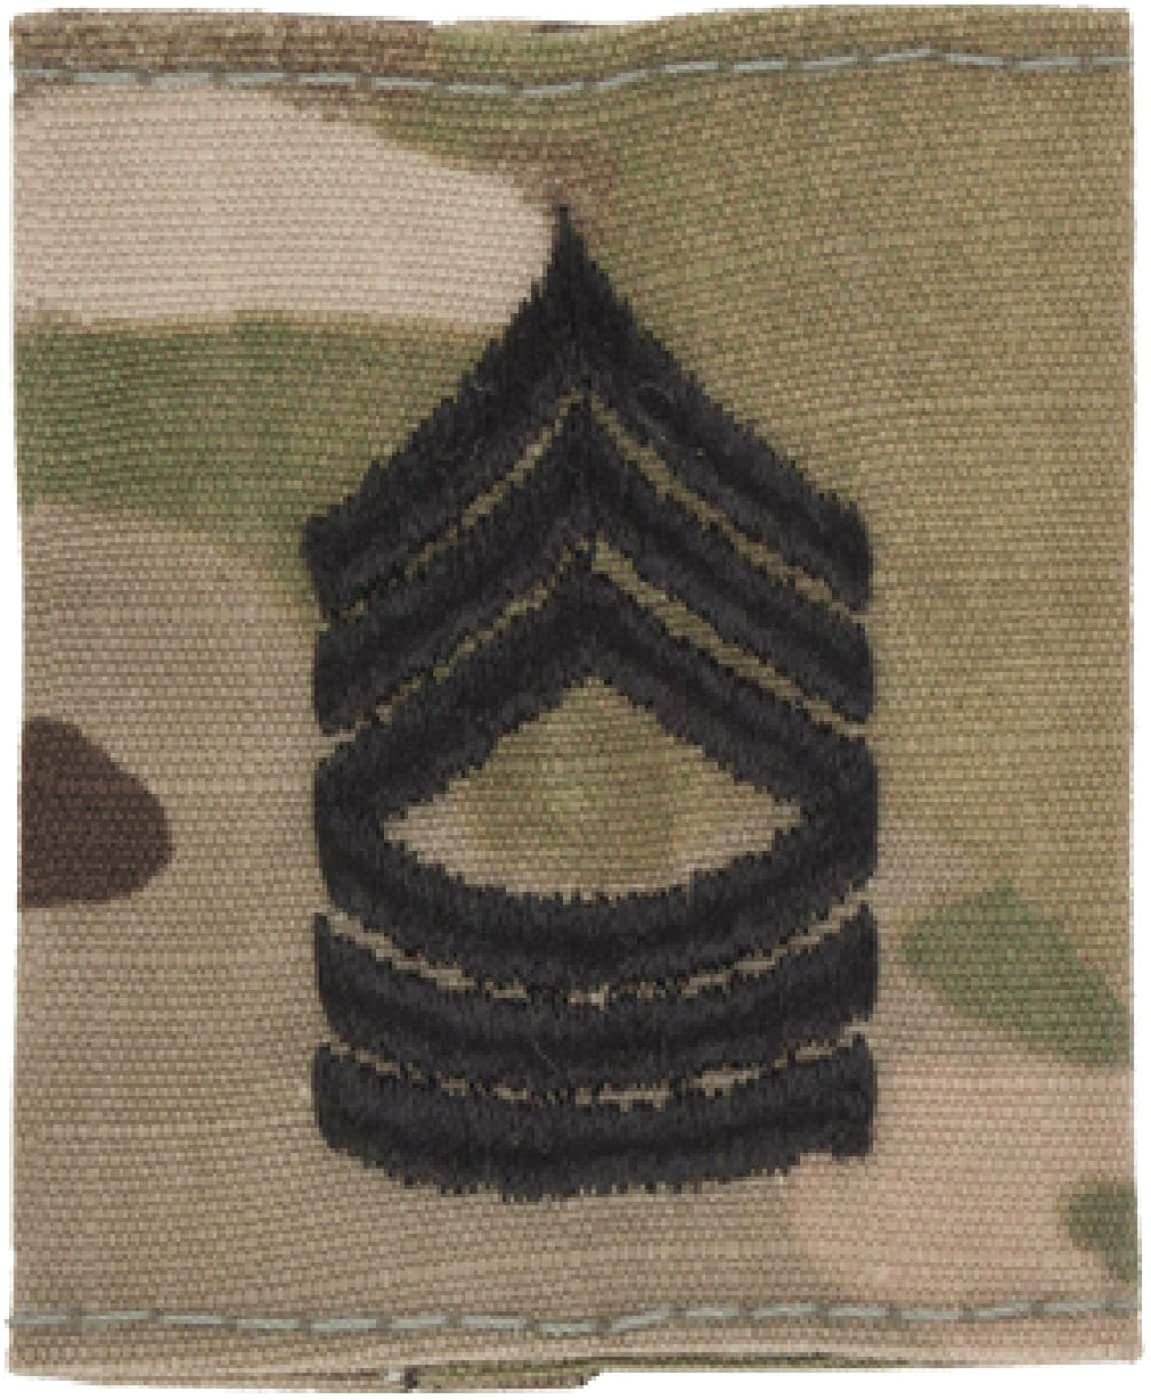 U.S. Army OCP RANK Insignia for Enlisted W2 Scorpion - GORE-TEX LOOP